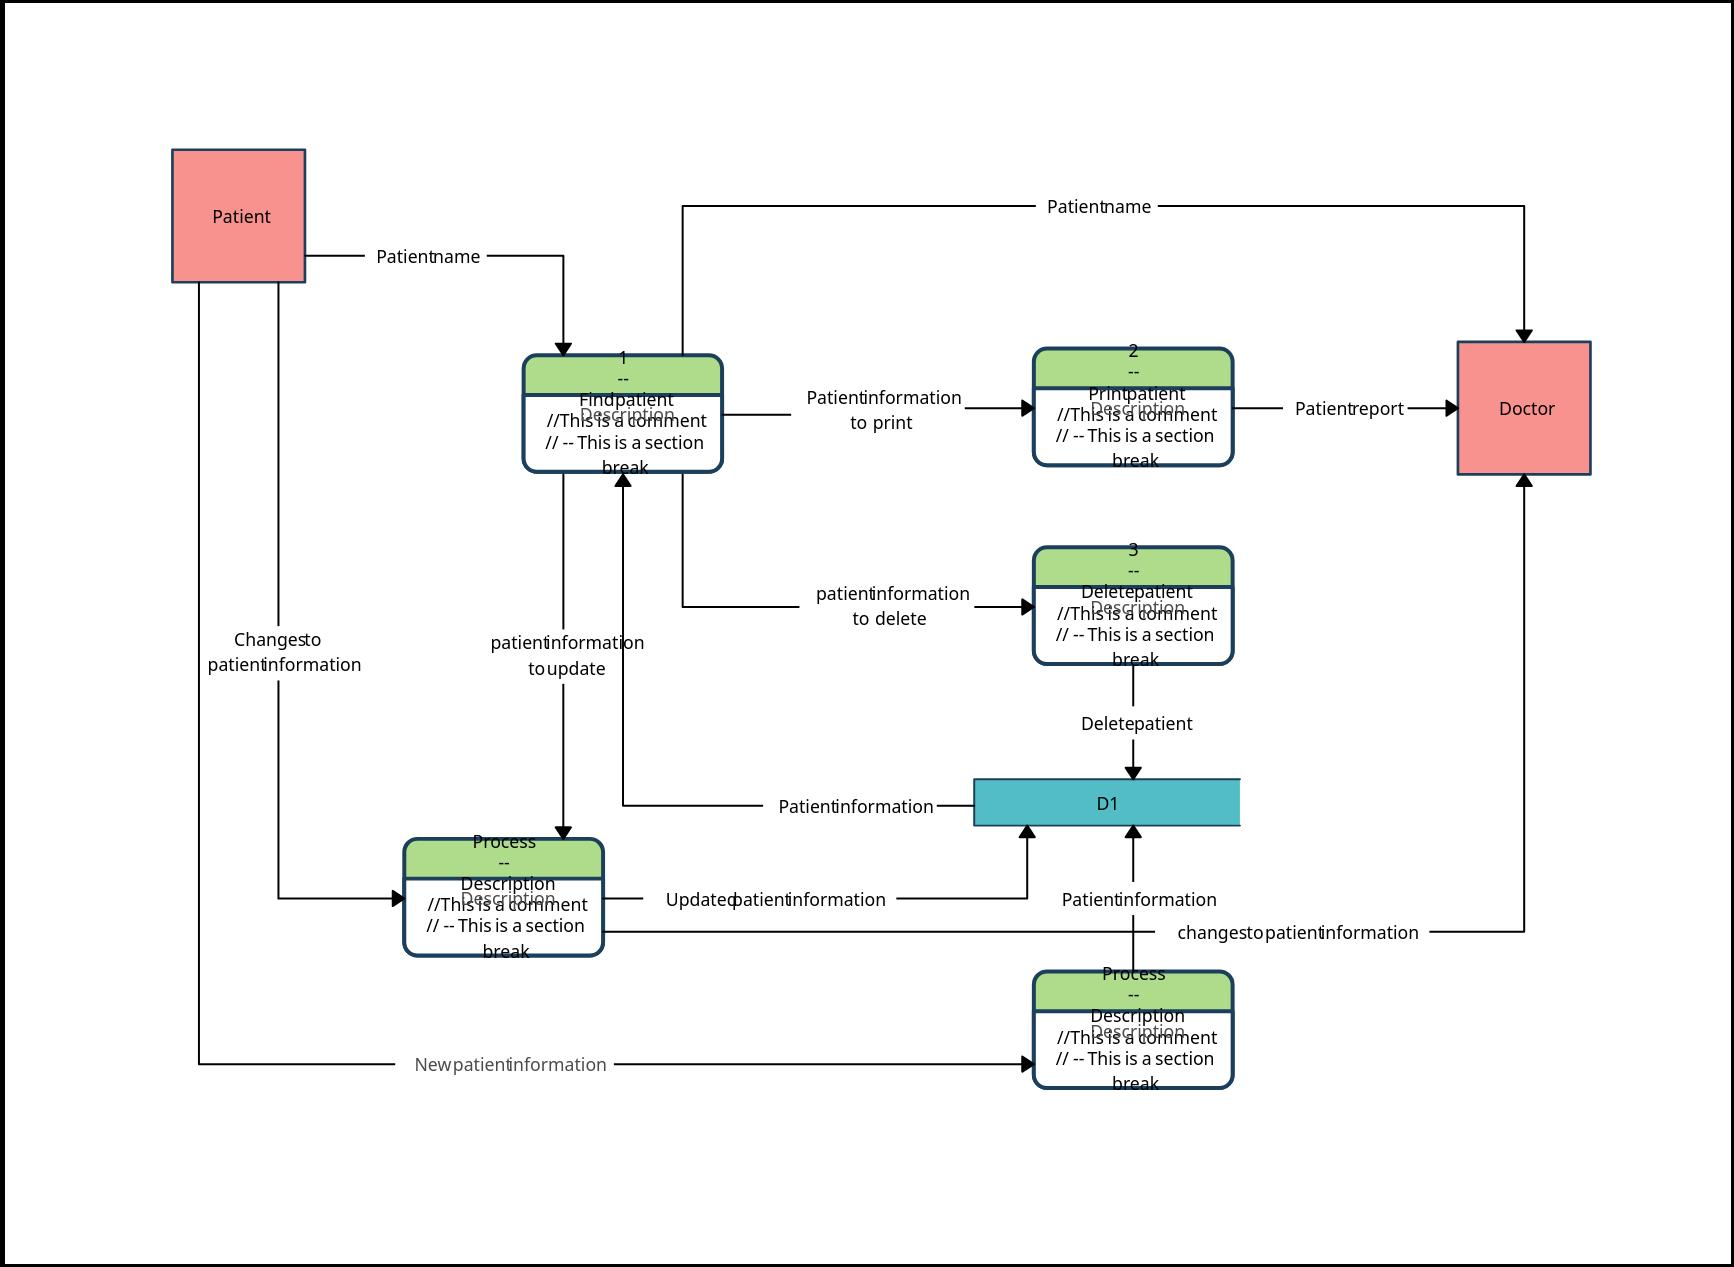 Patient Information System - Data Flow